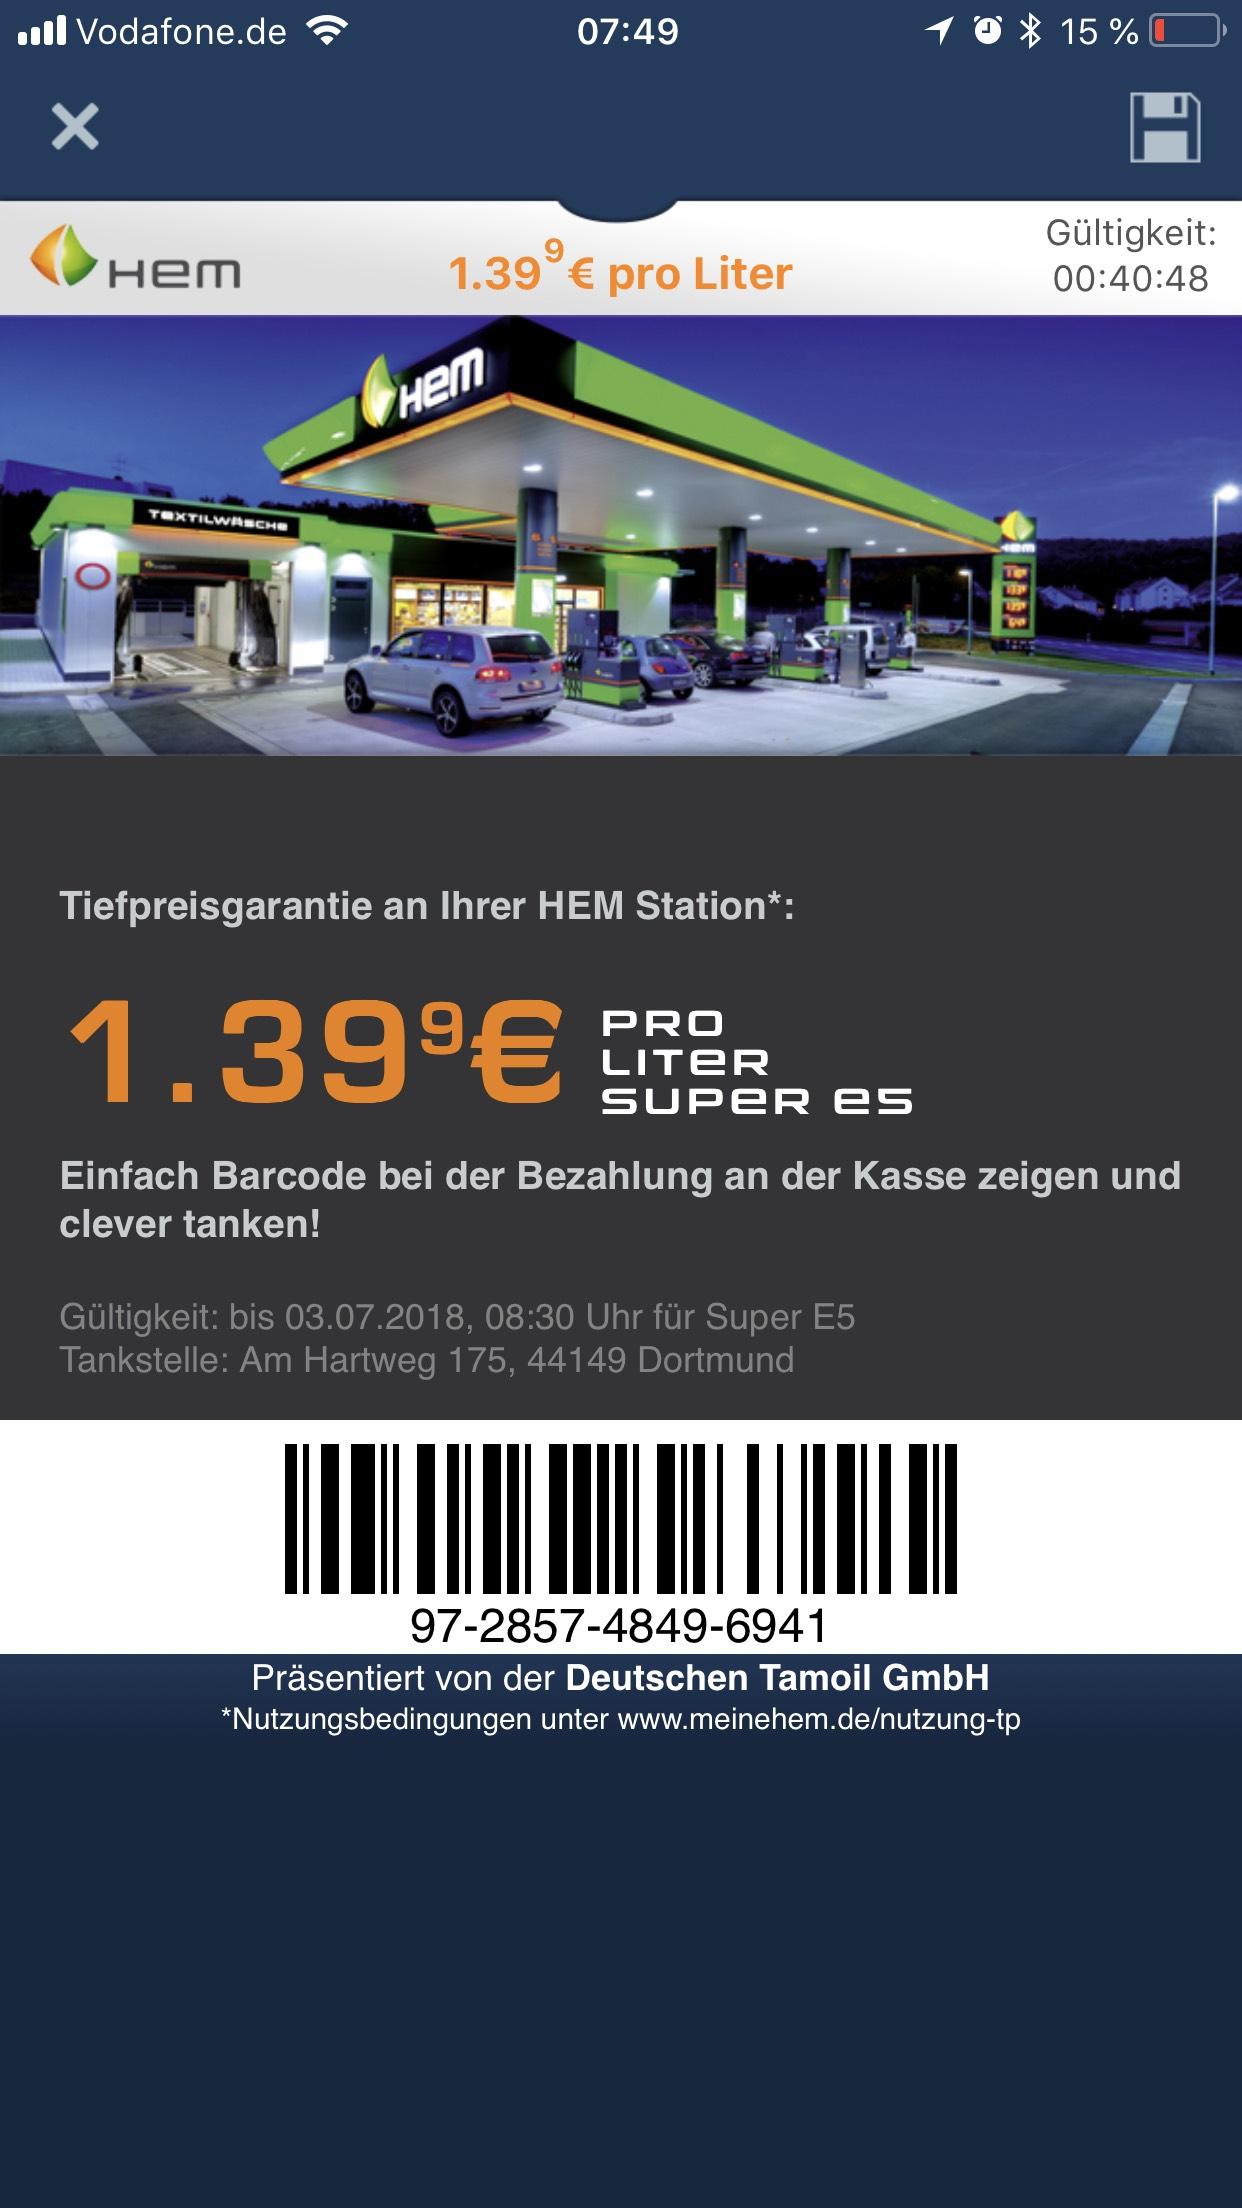 Tanken zum Sonderpreis via clever-tanken app (Super E5 ) in Dortmund